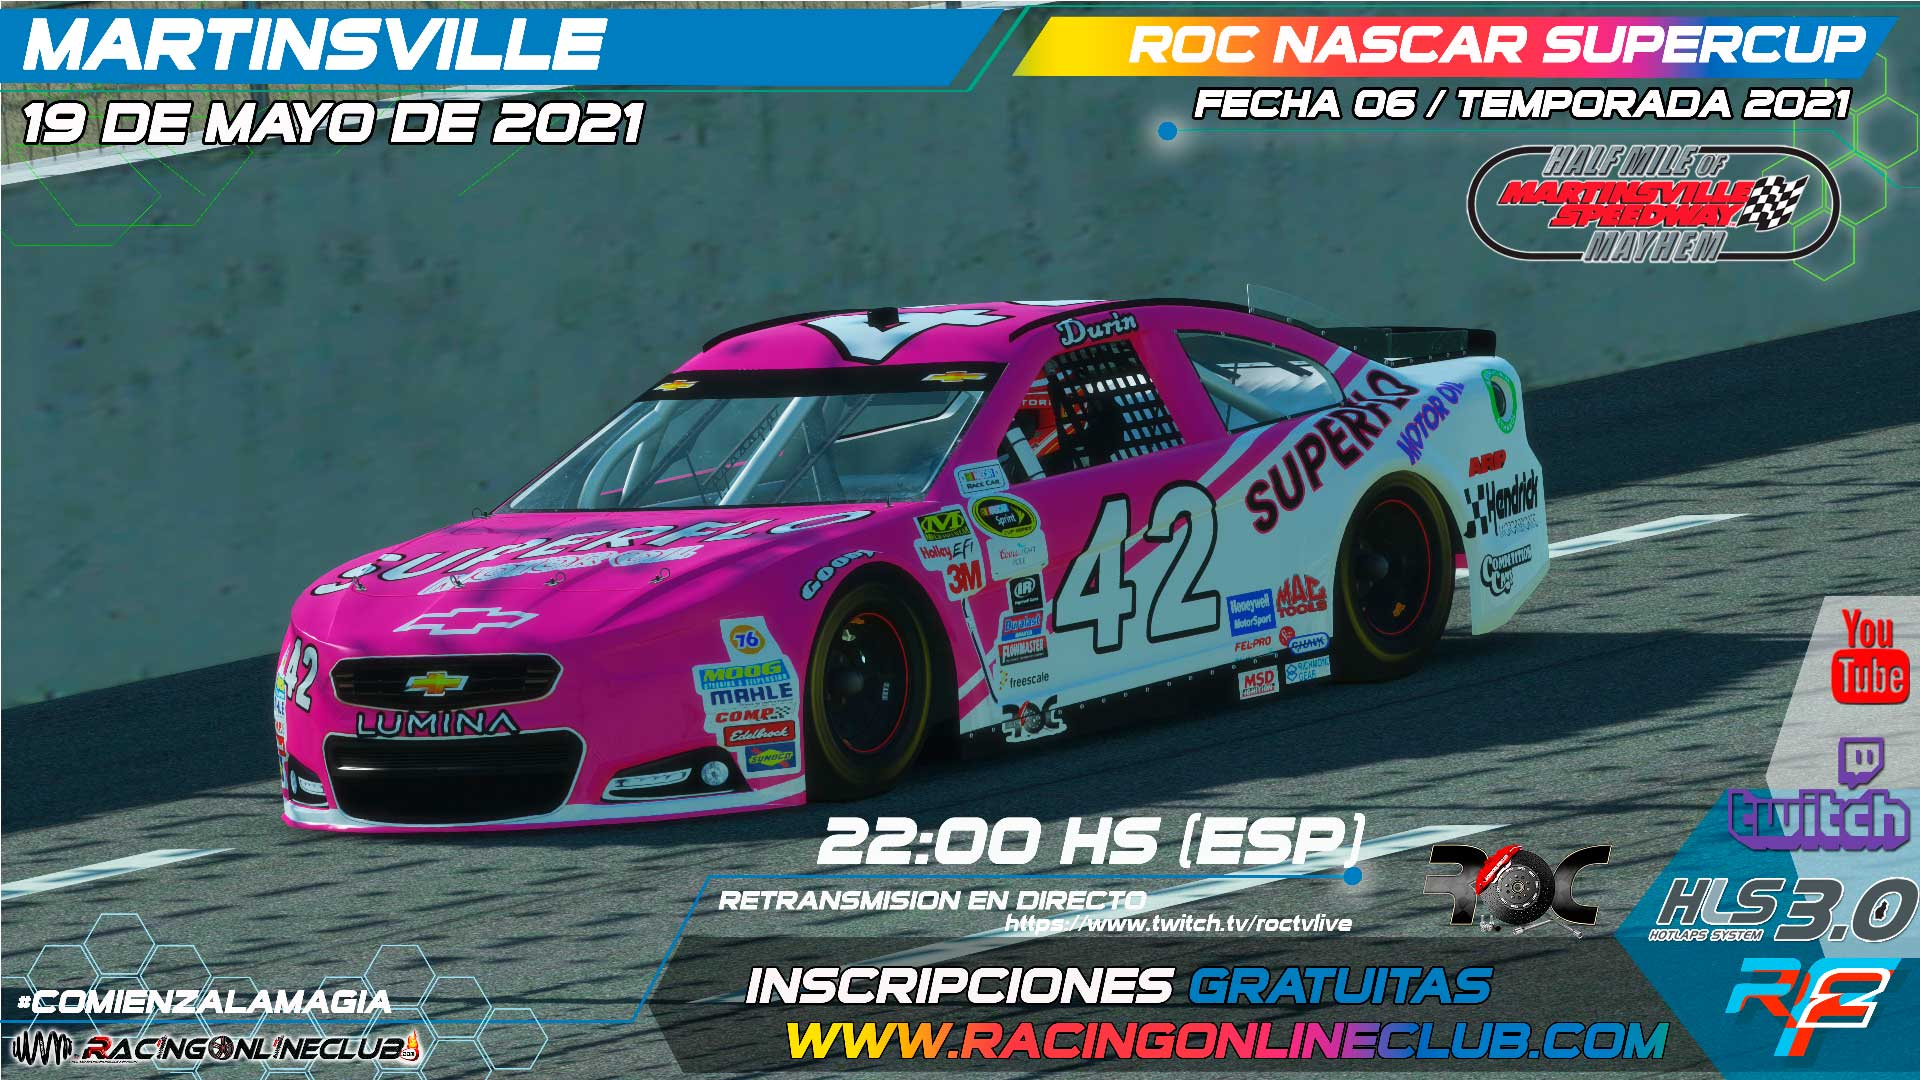 Martinsville NASCAR SuperCup